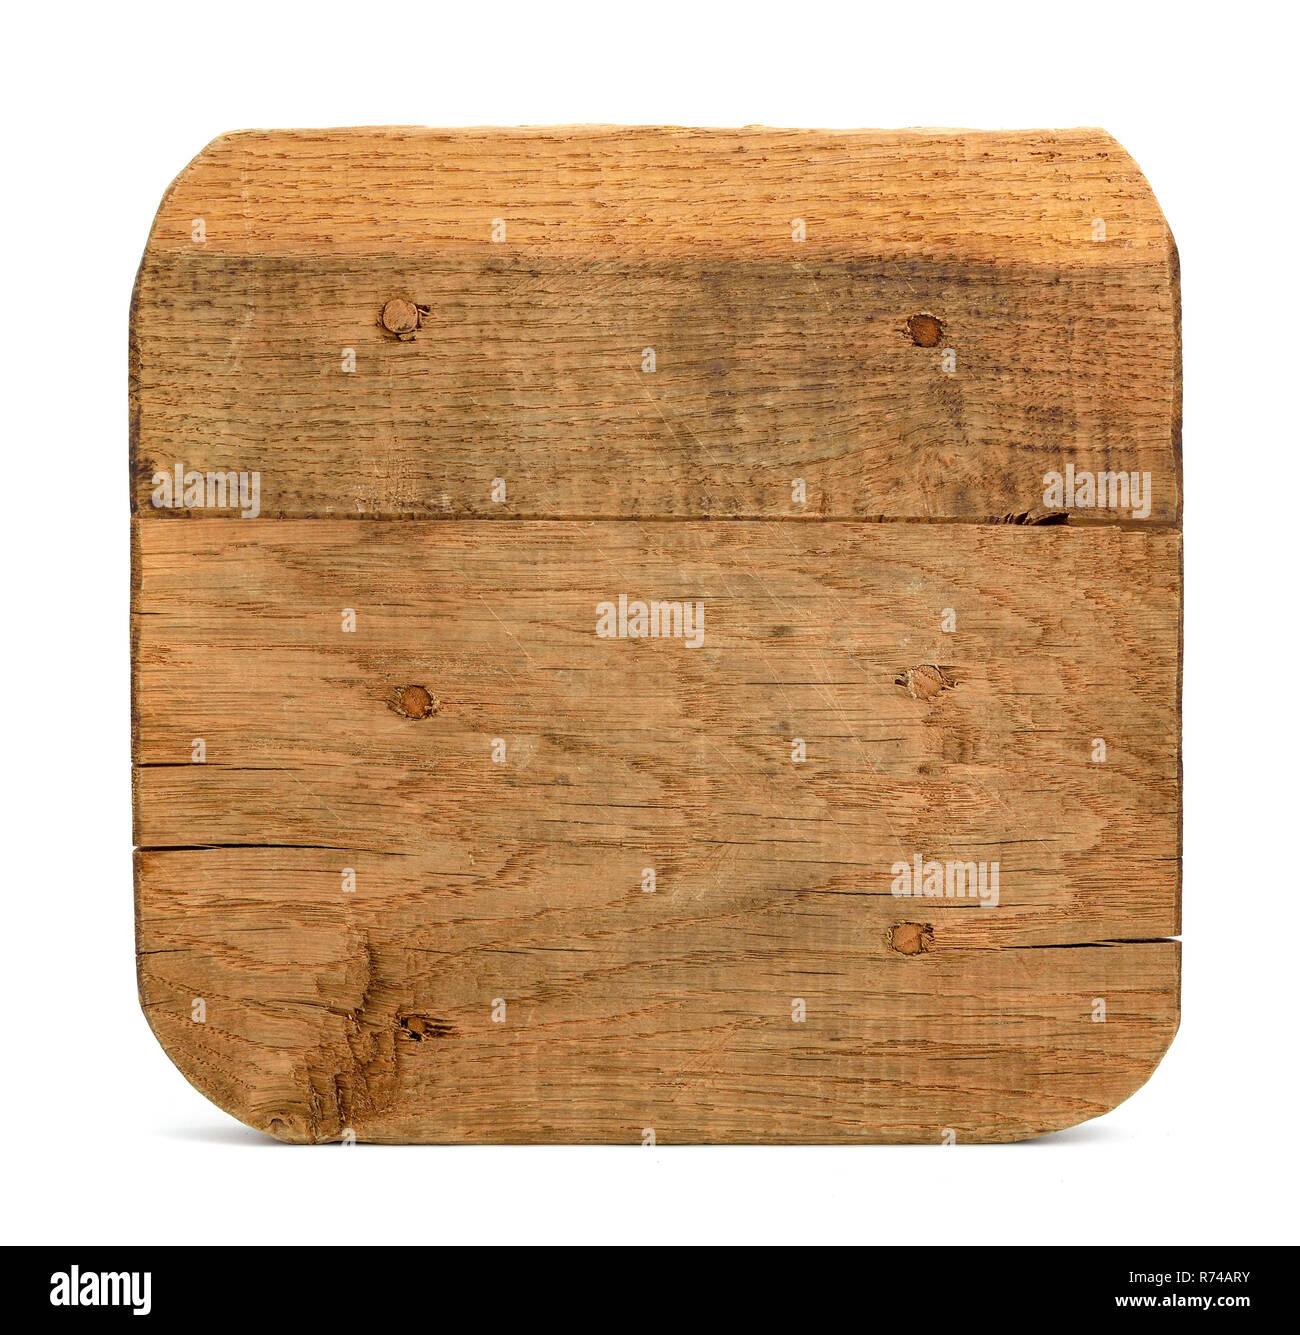 Oak board isolated. - Stock Image